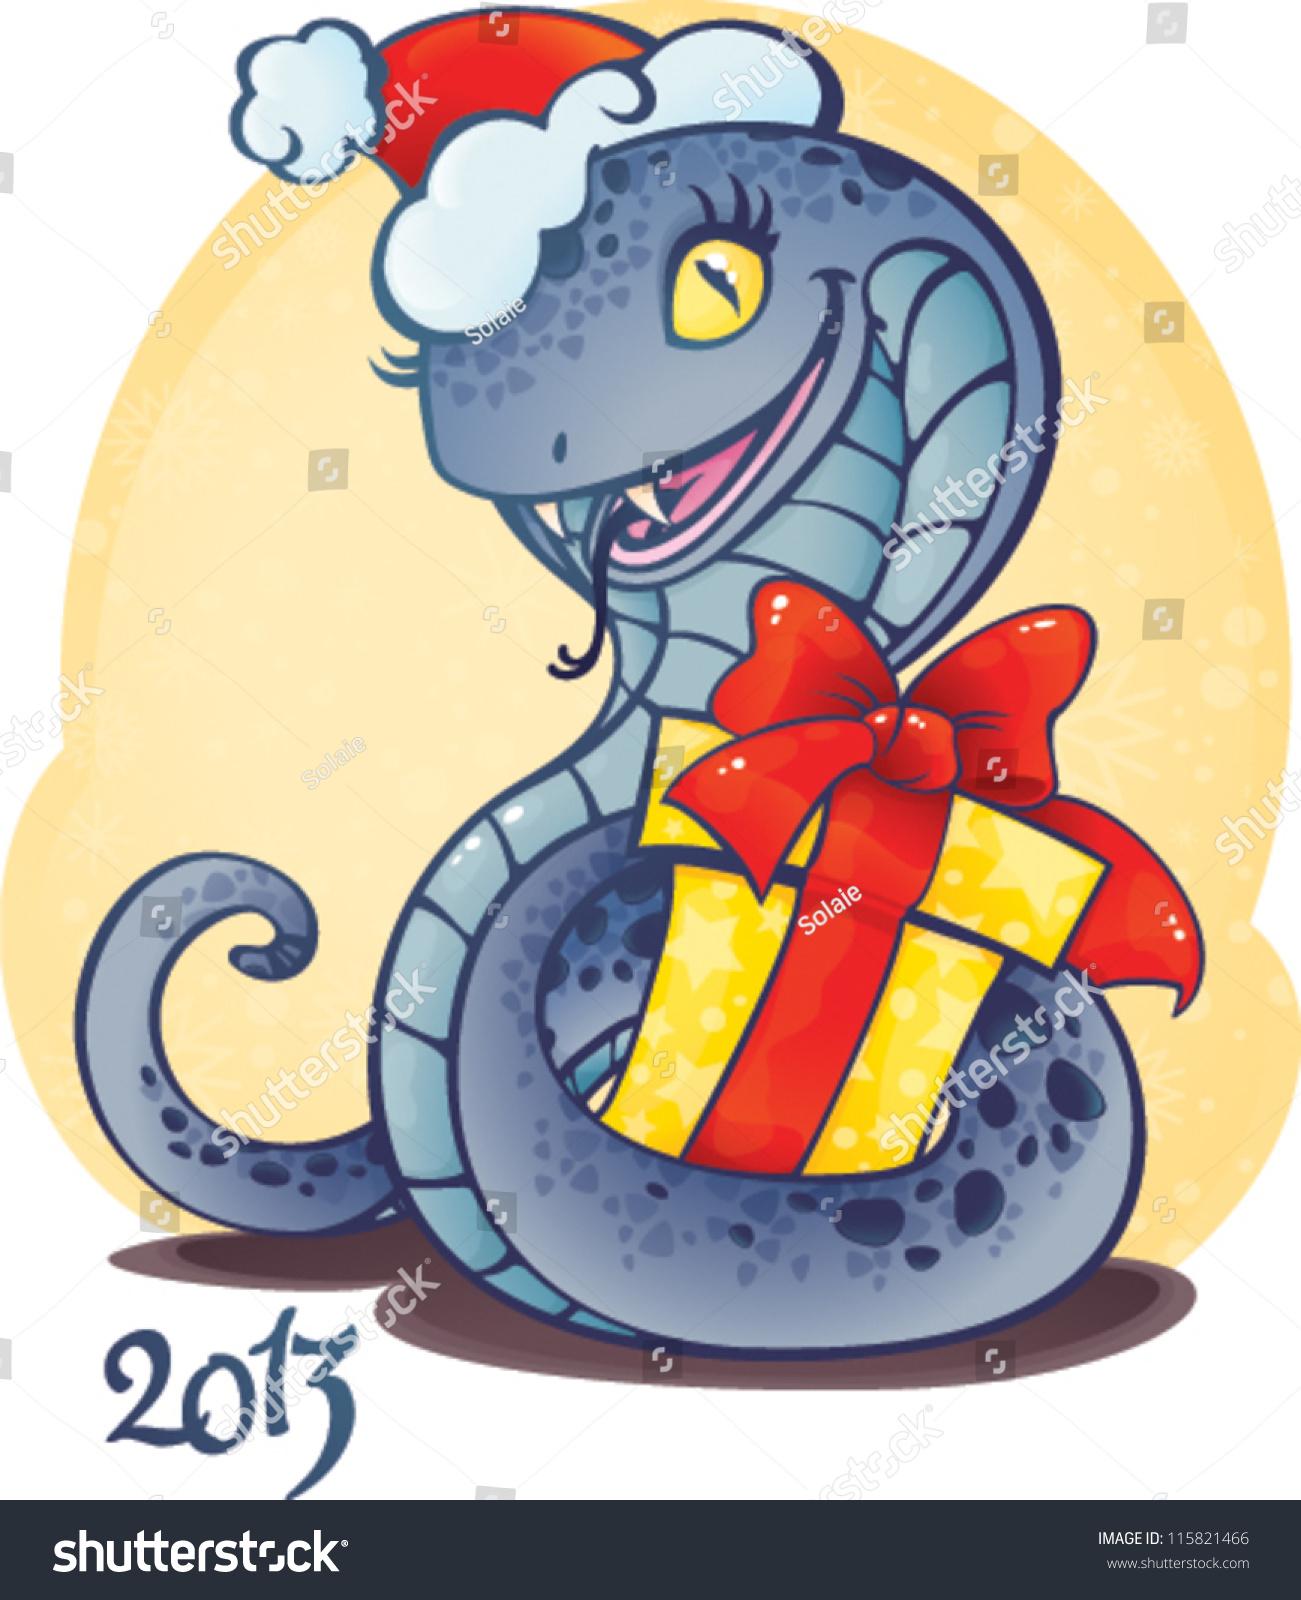 Cute snake symbol chinese horoscope new stock vector 115821466 cute snake symbol of chinese horoscope for new 2013 year biocorpaavc